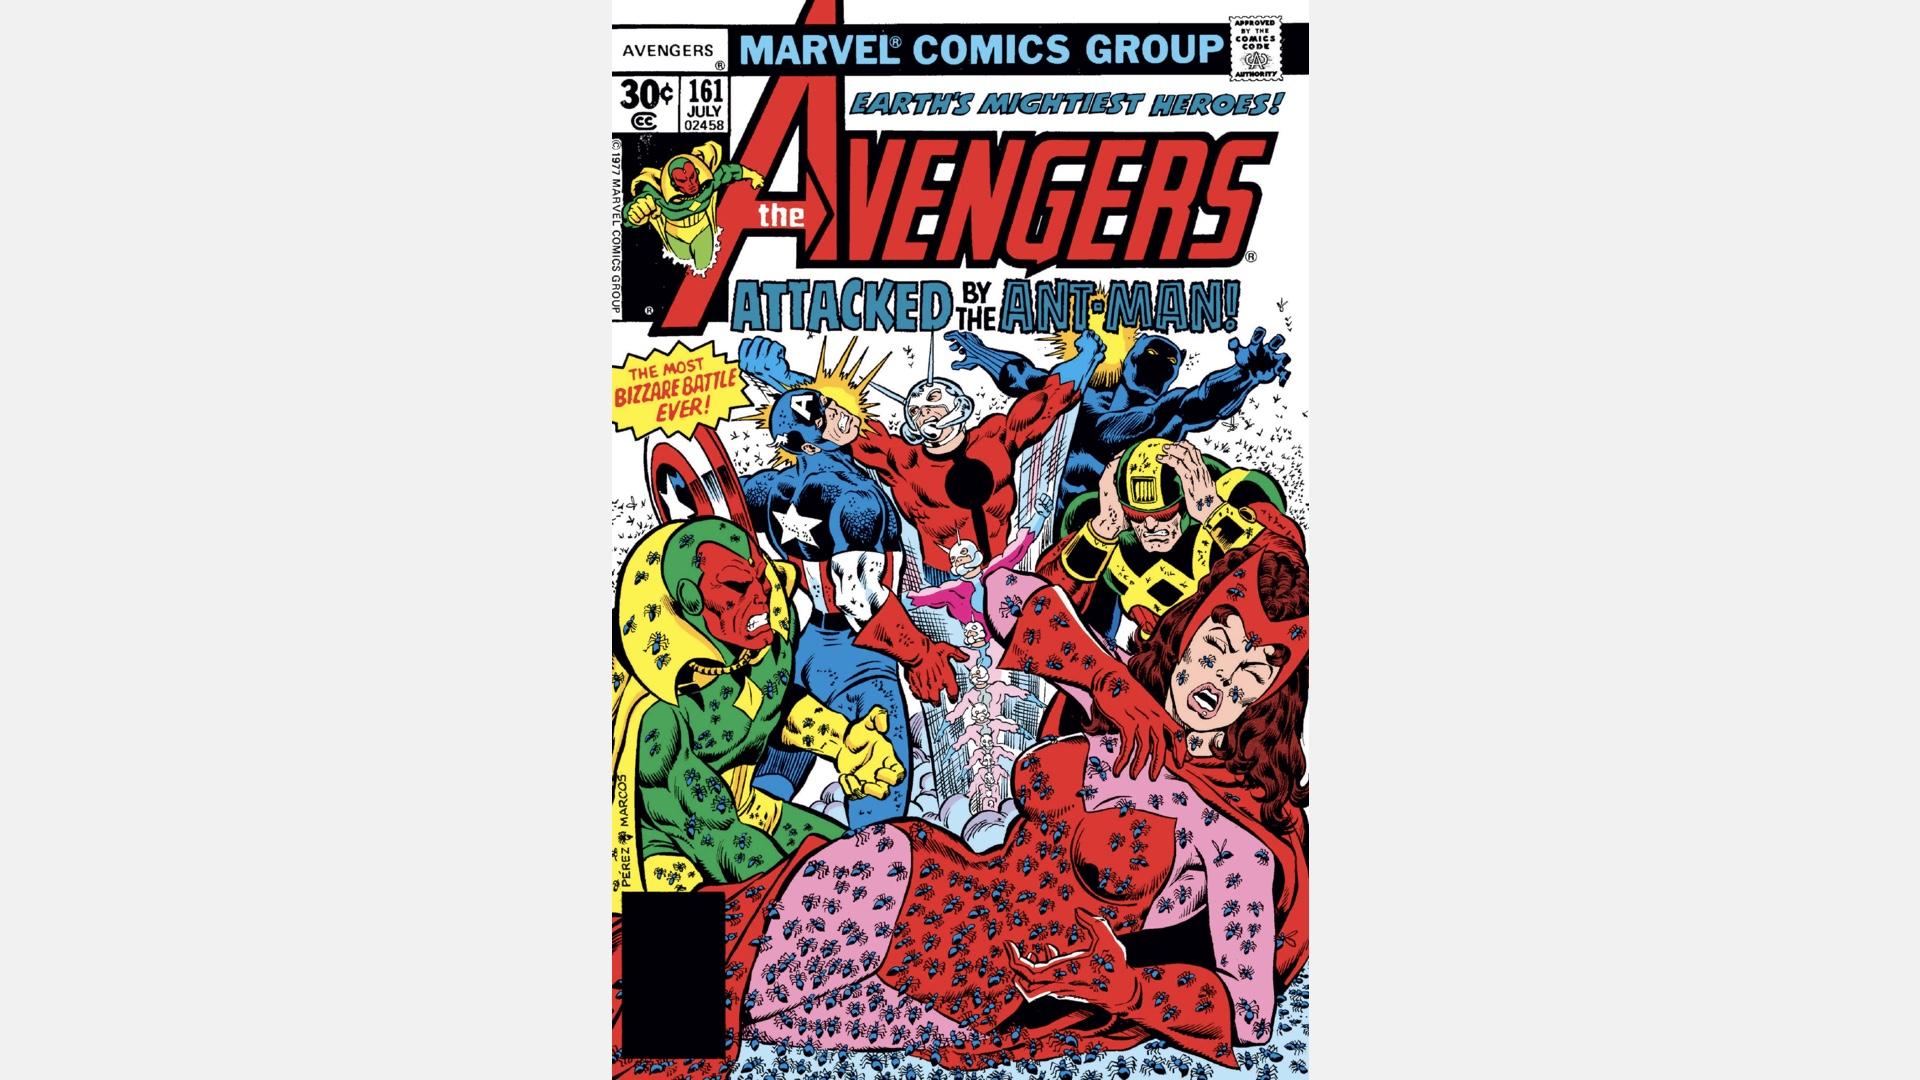 cover of Avengers #161